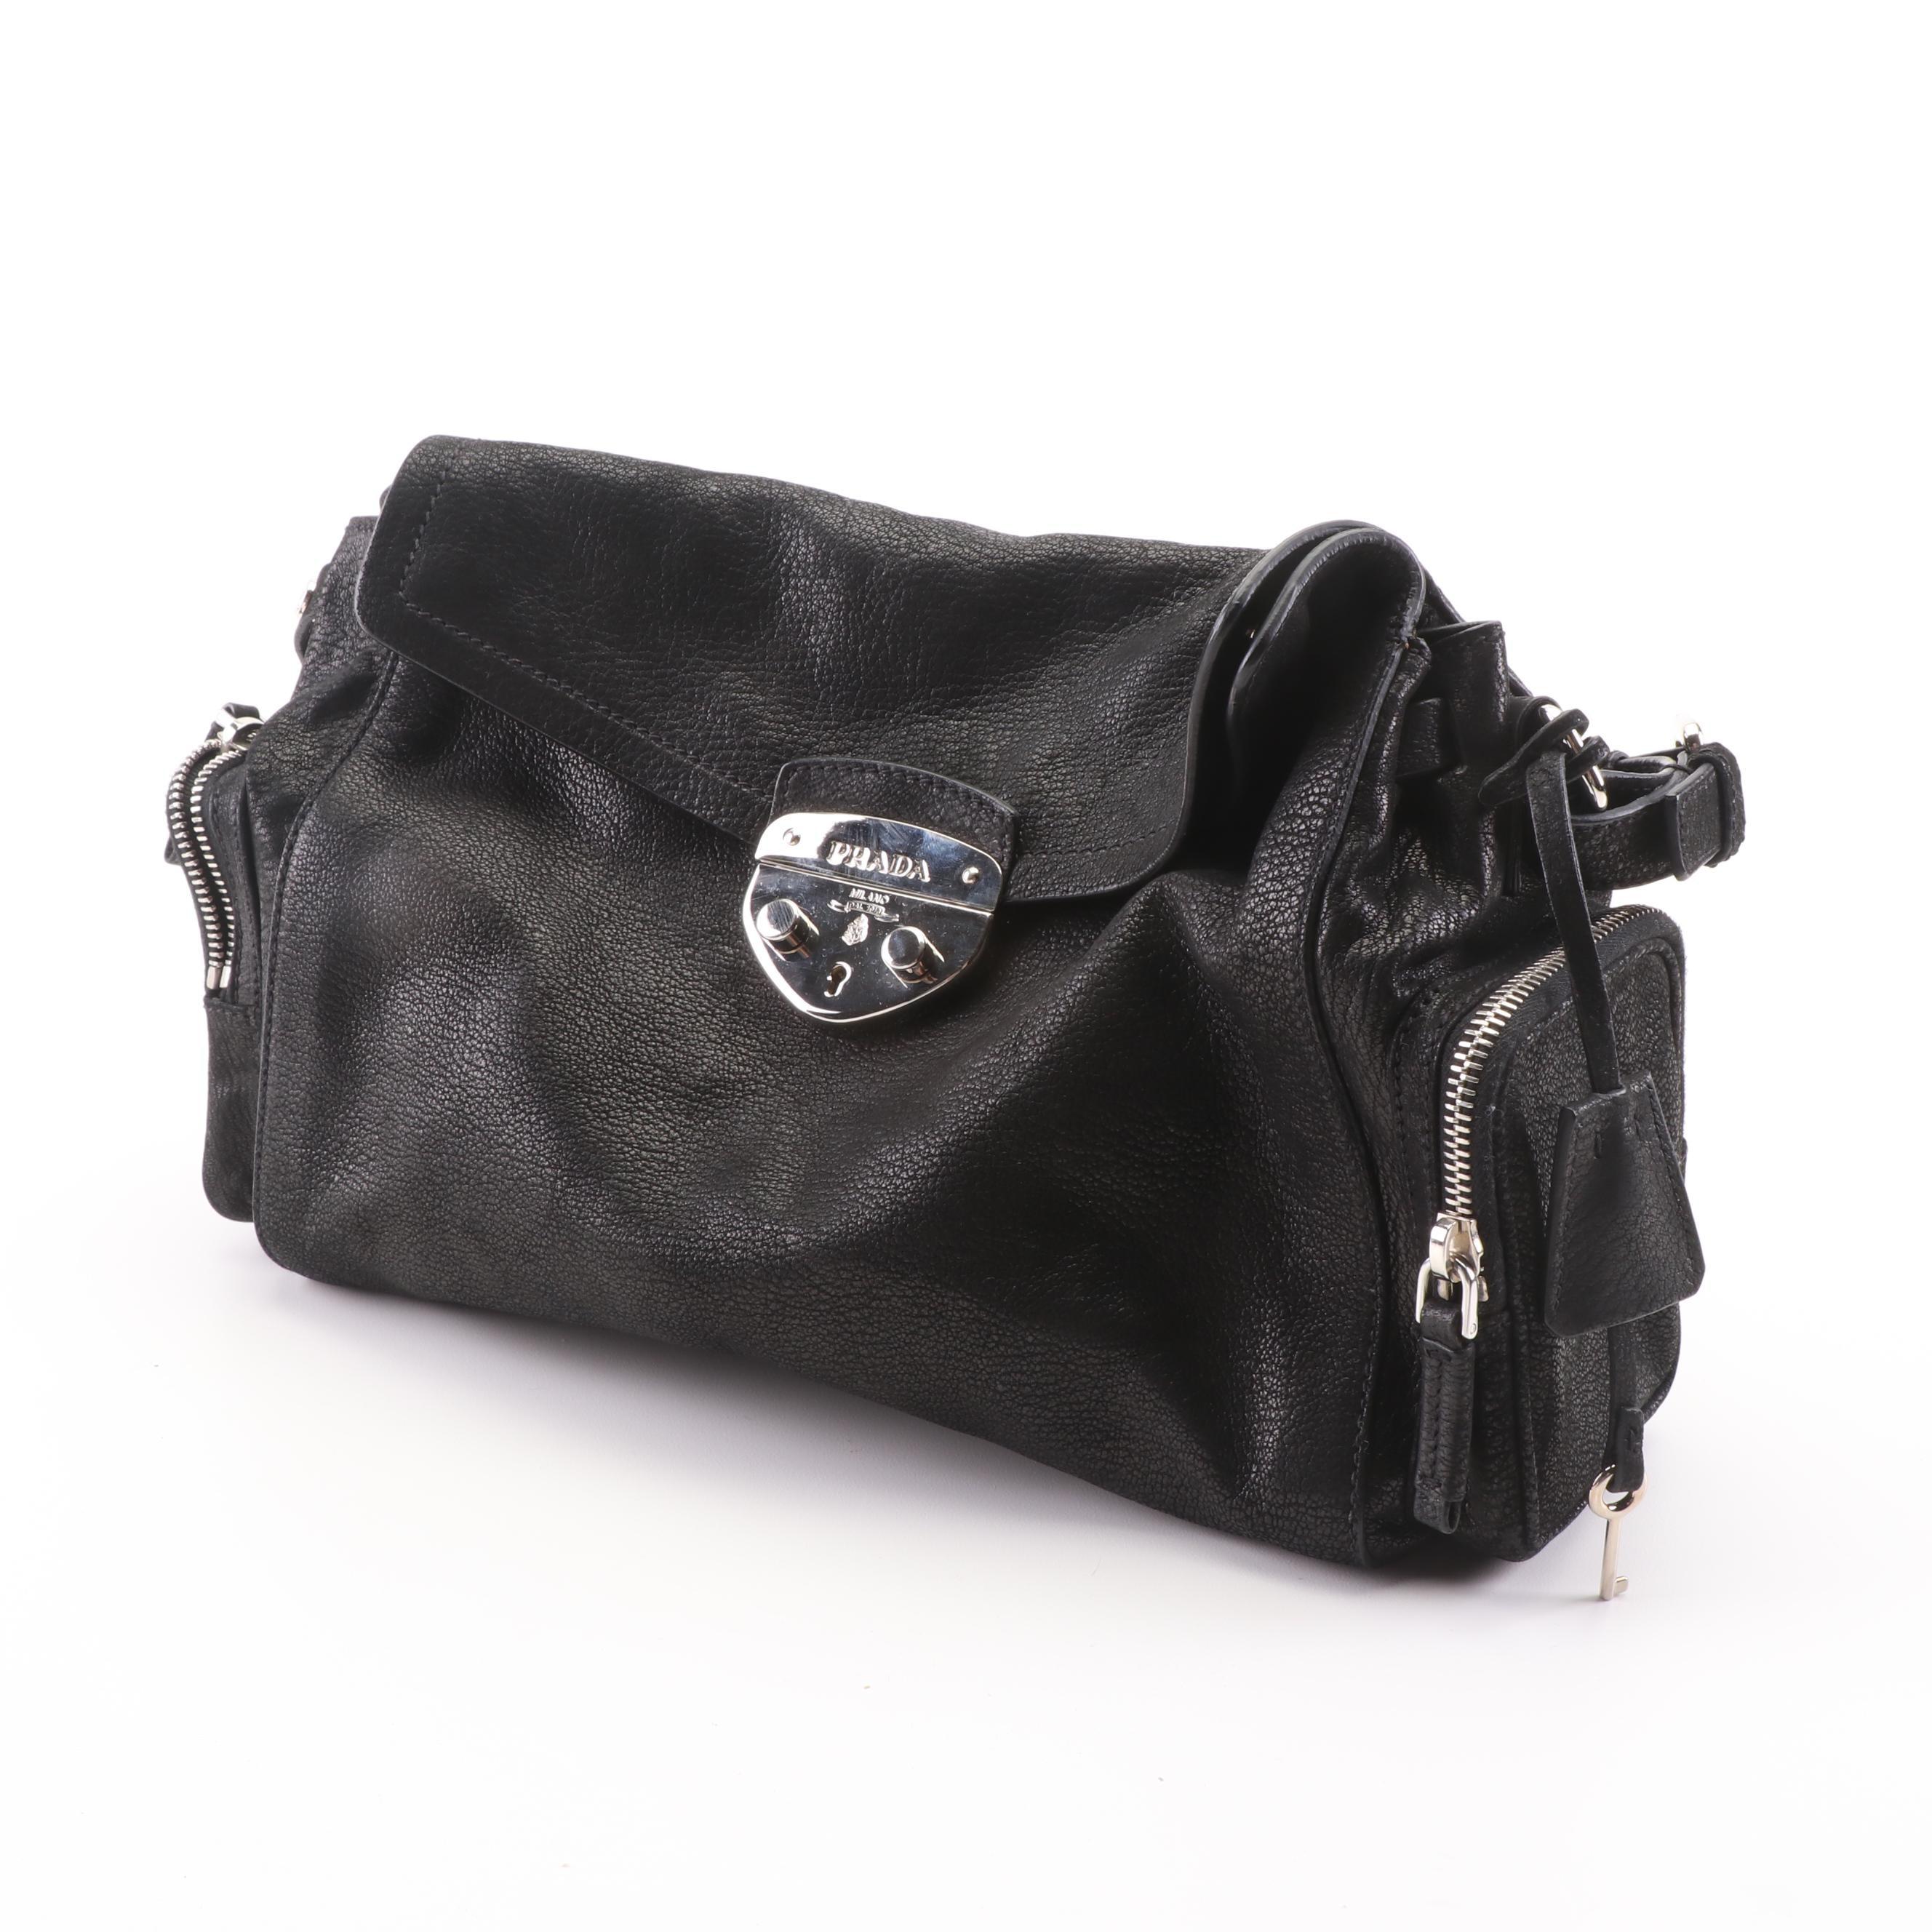 Prada Antic Easy A Pattina Black Leather Shoulder Bag